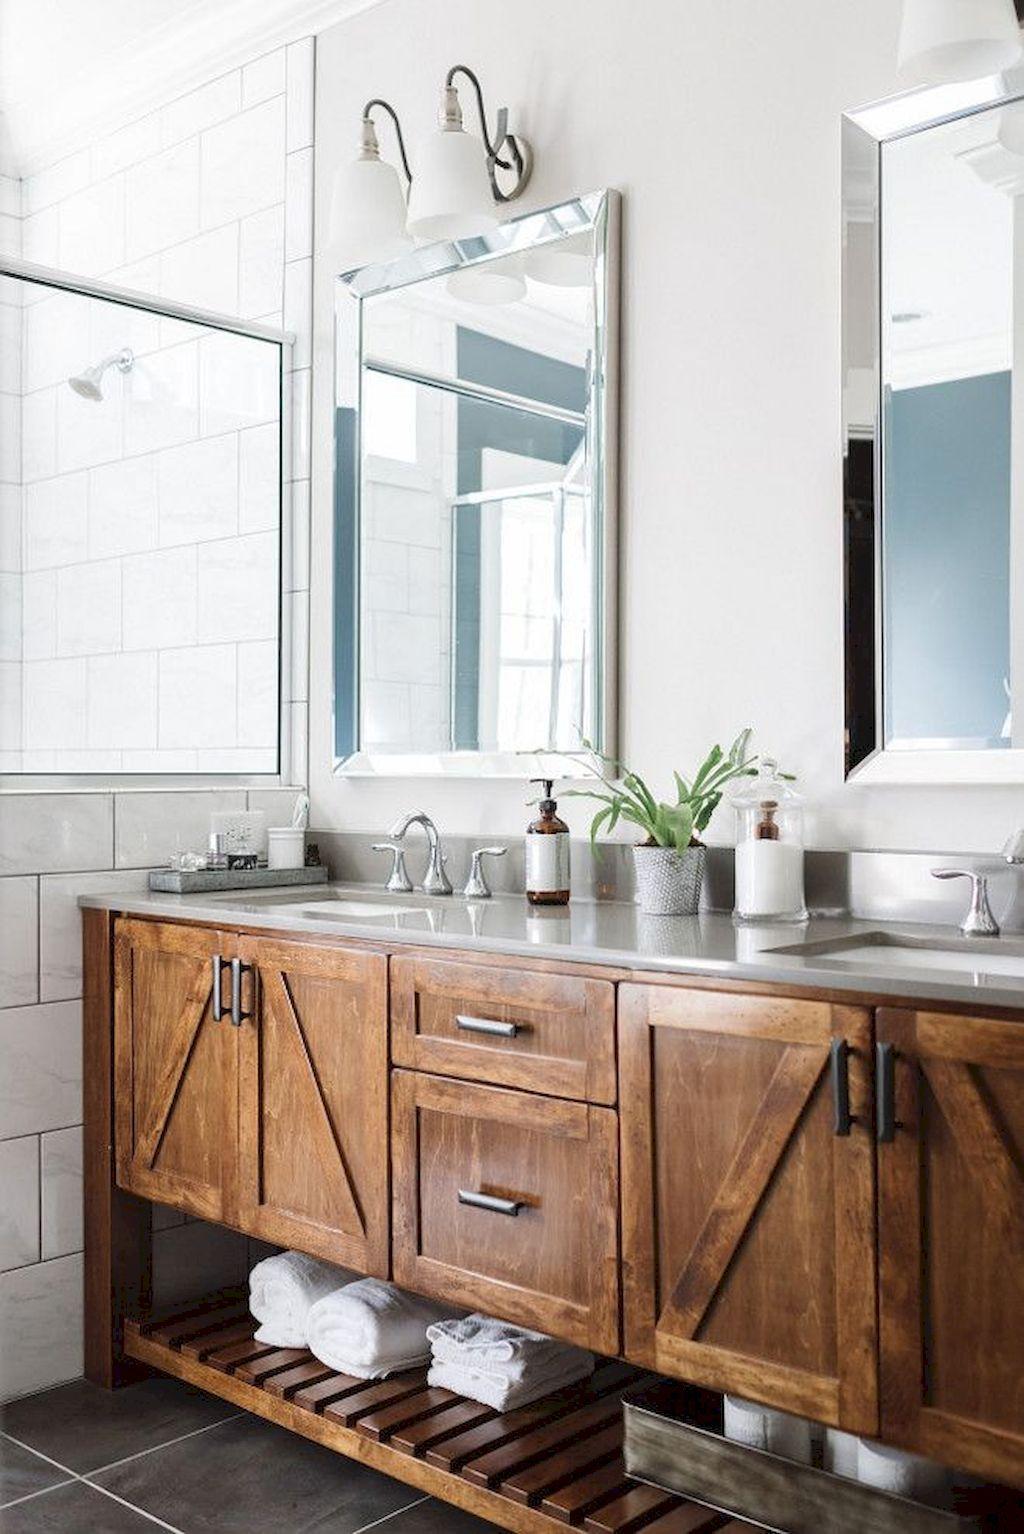 40 Amazing Rustic Bathroom Vanities Ideas & Designs - Home ...